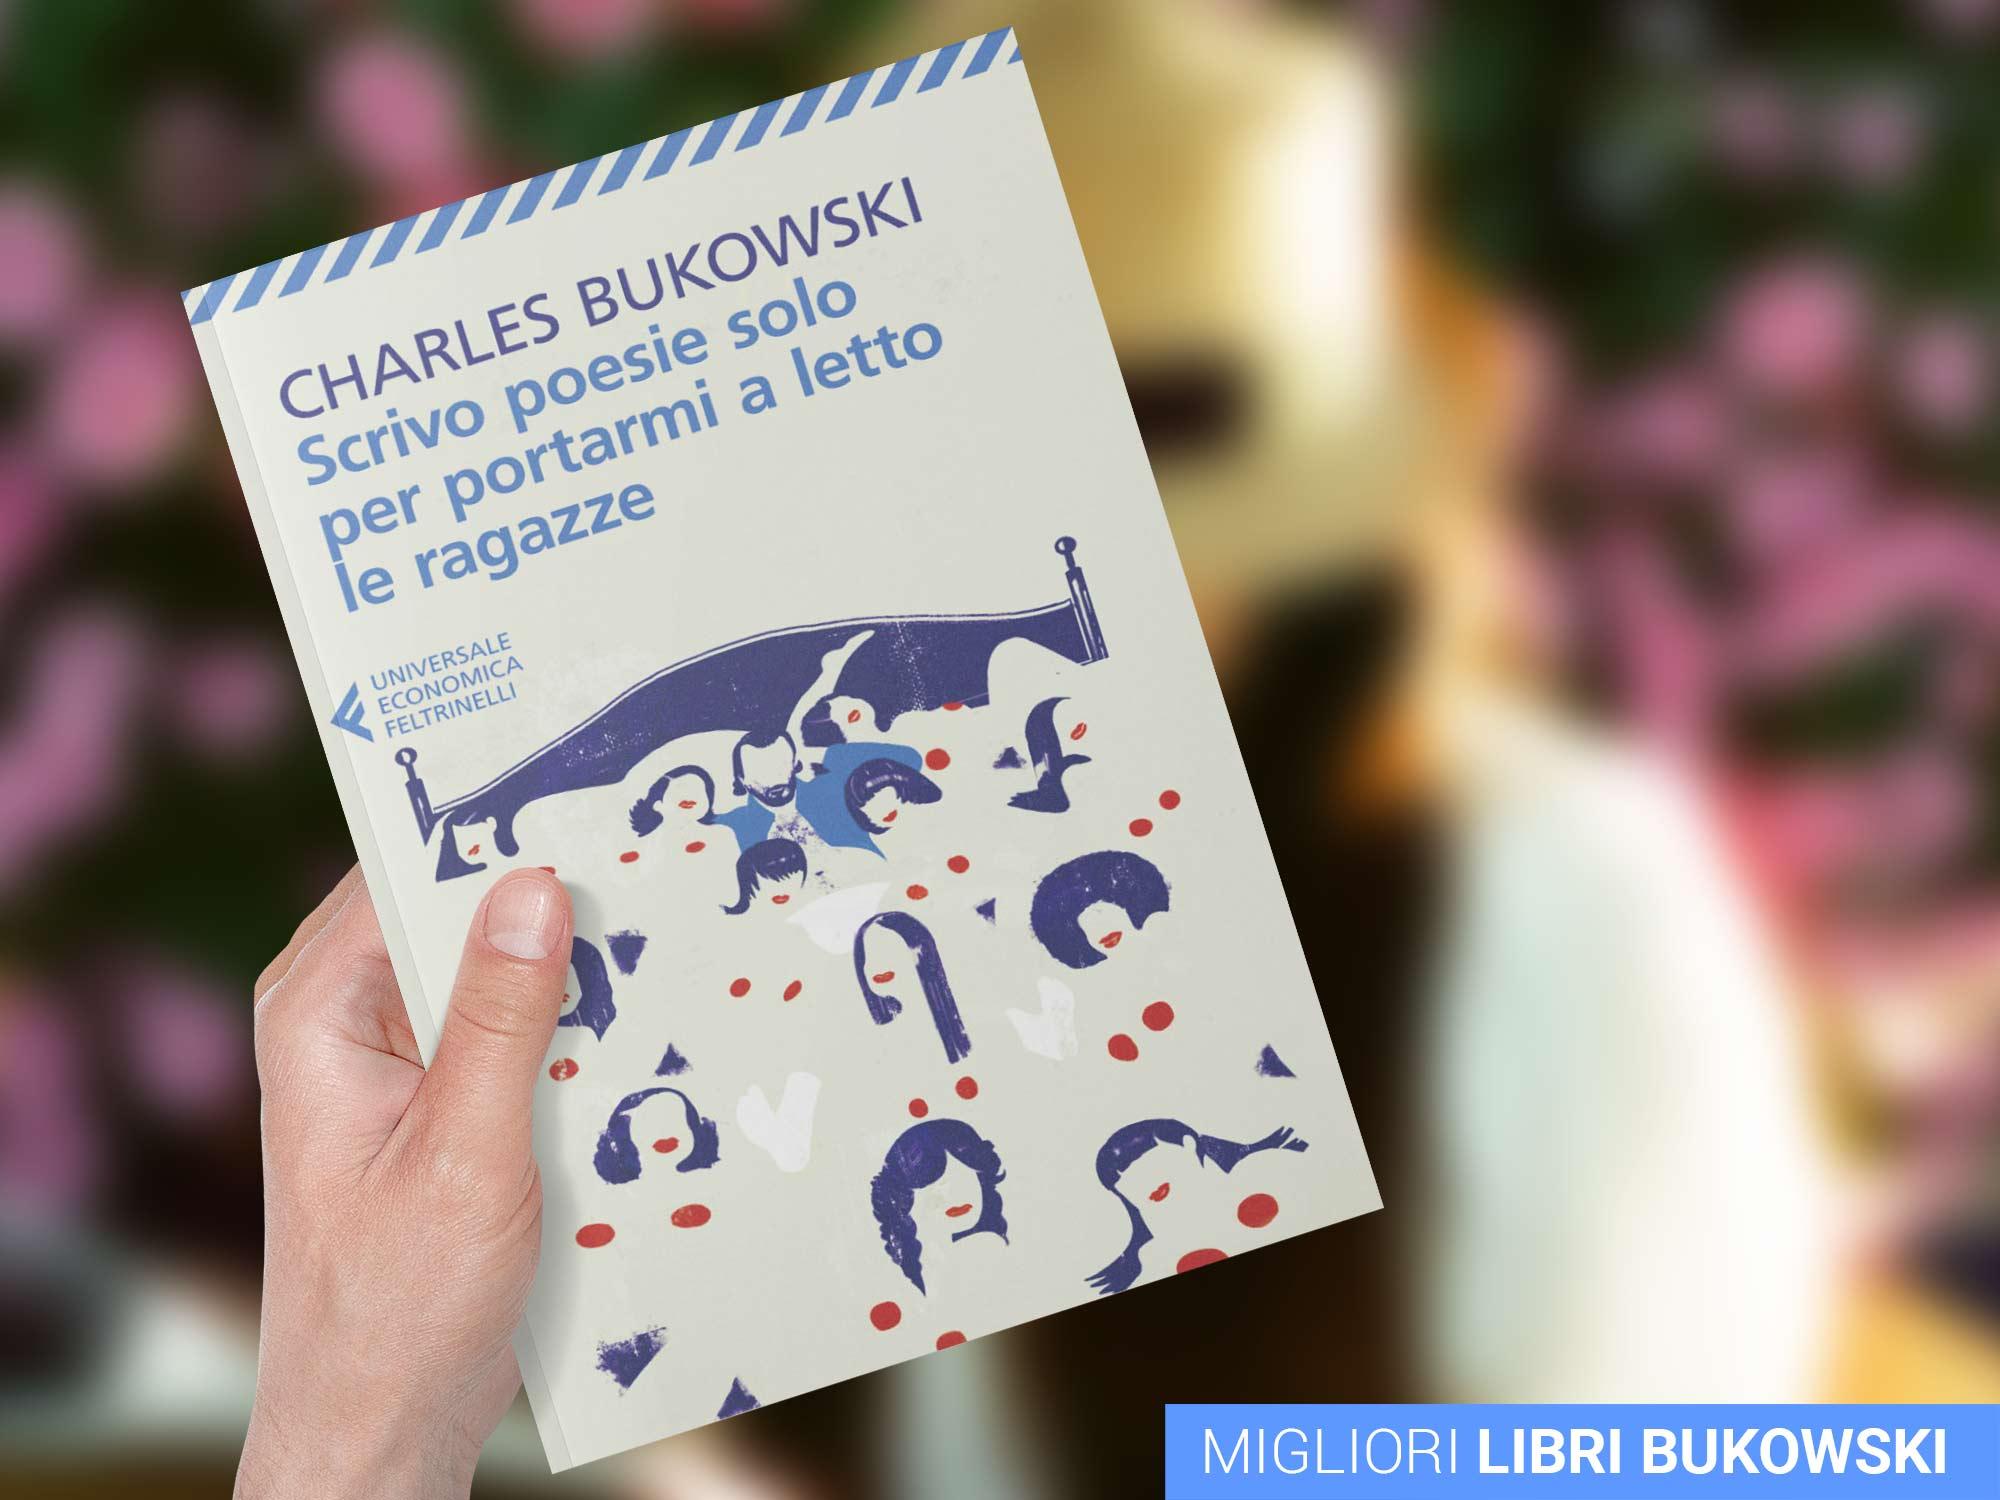 libri-racconti-donne-charles-bukowski